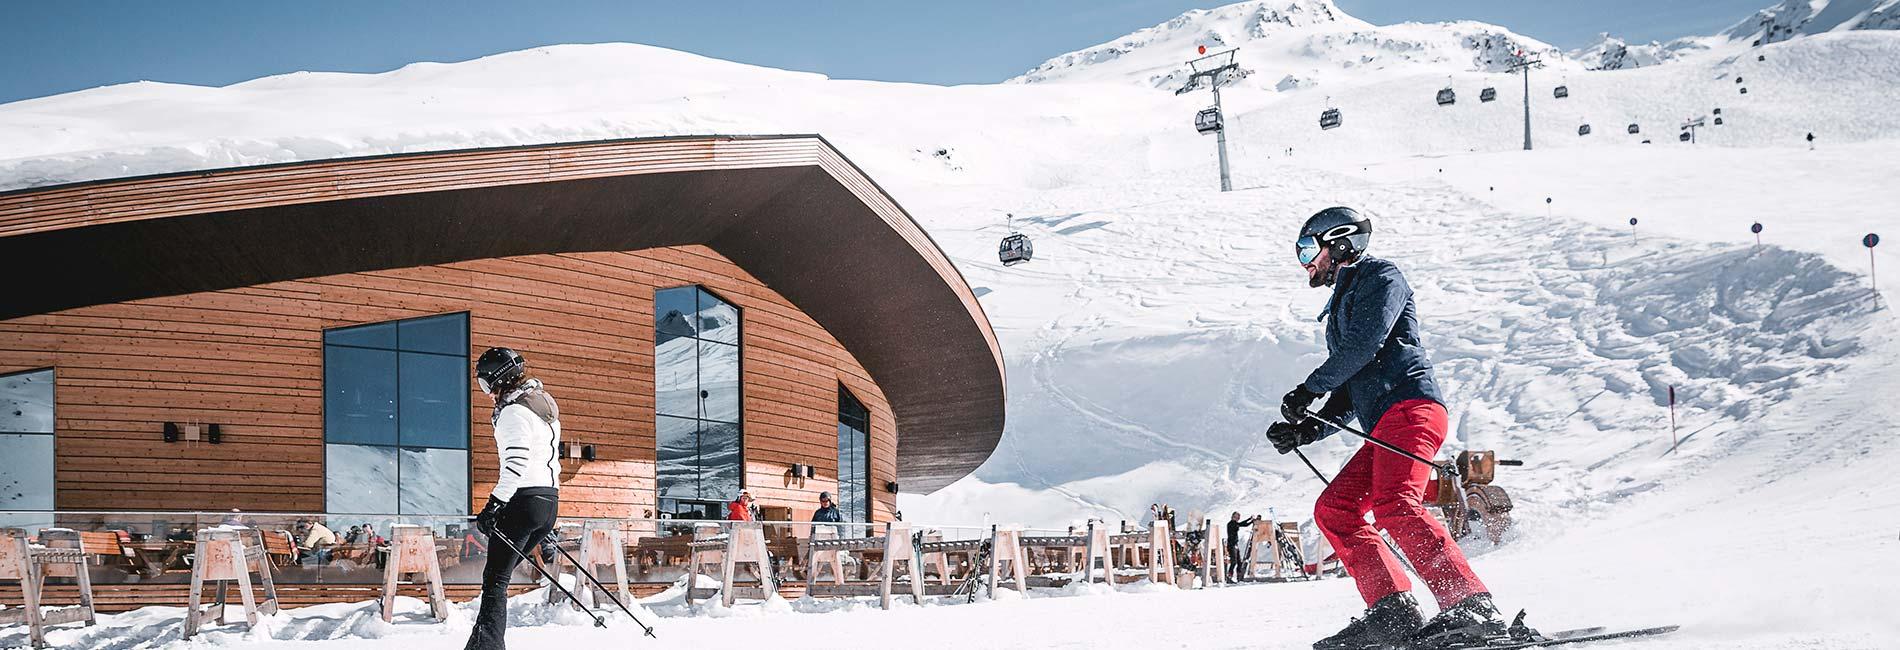 TOP Mountain Crosspoint im Skigebiet Obergurgl Hochgurgl Ötztal Tirol Austria